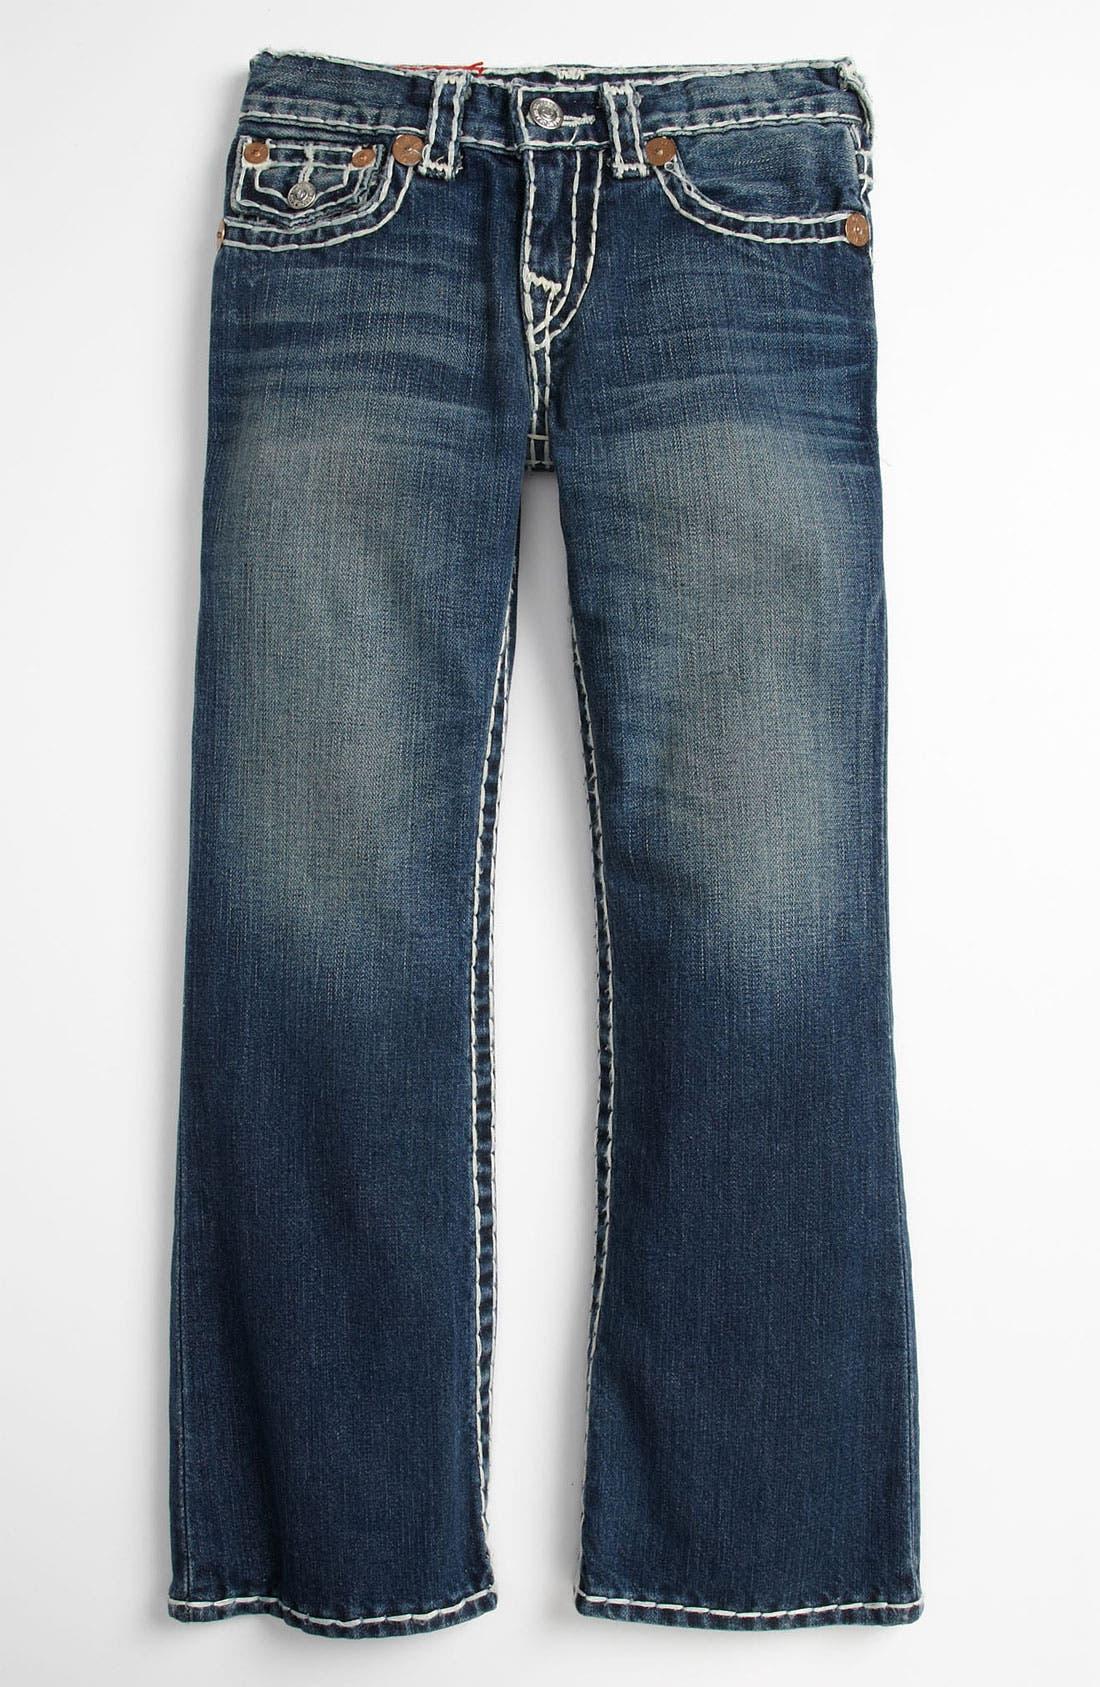 Alternate Image 2  - True Religion Brand Jeans 'Billy' Bootcut Jeans (Big Boys)